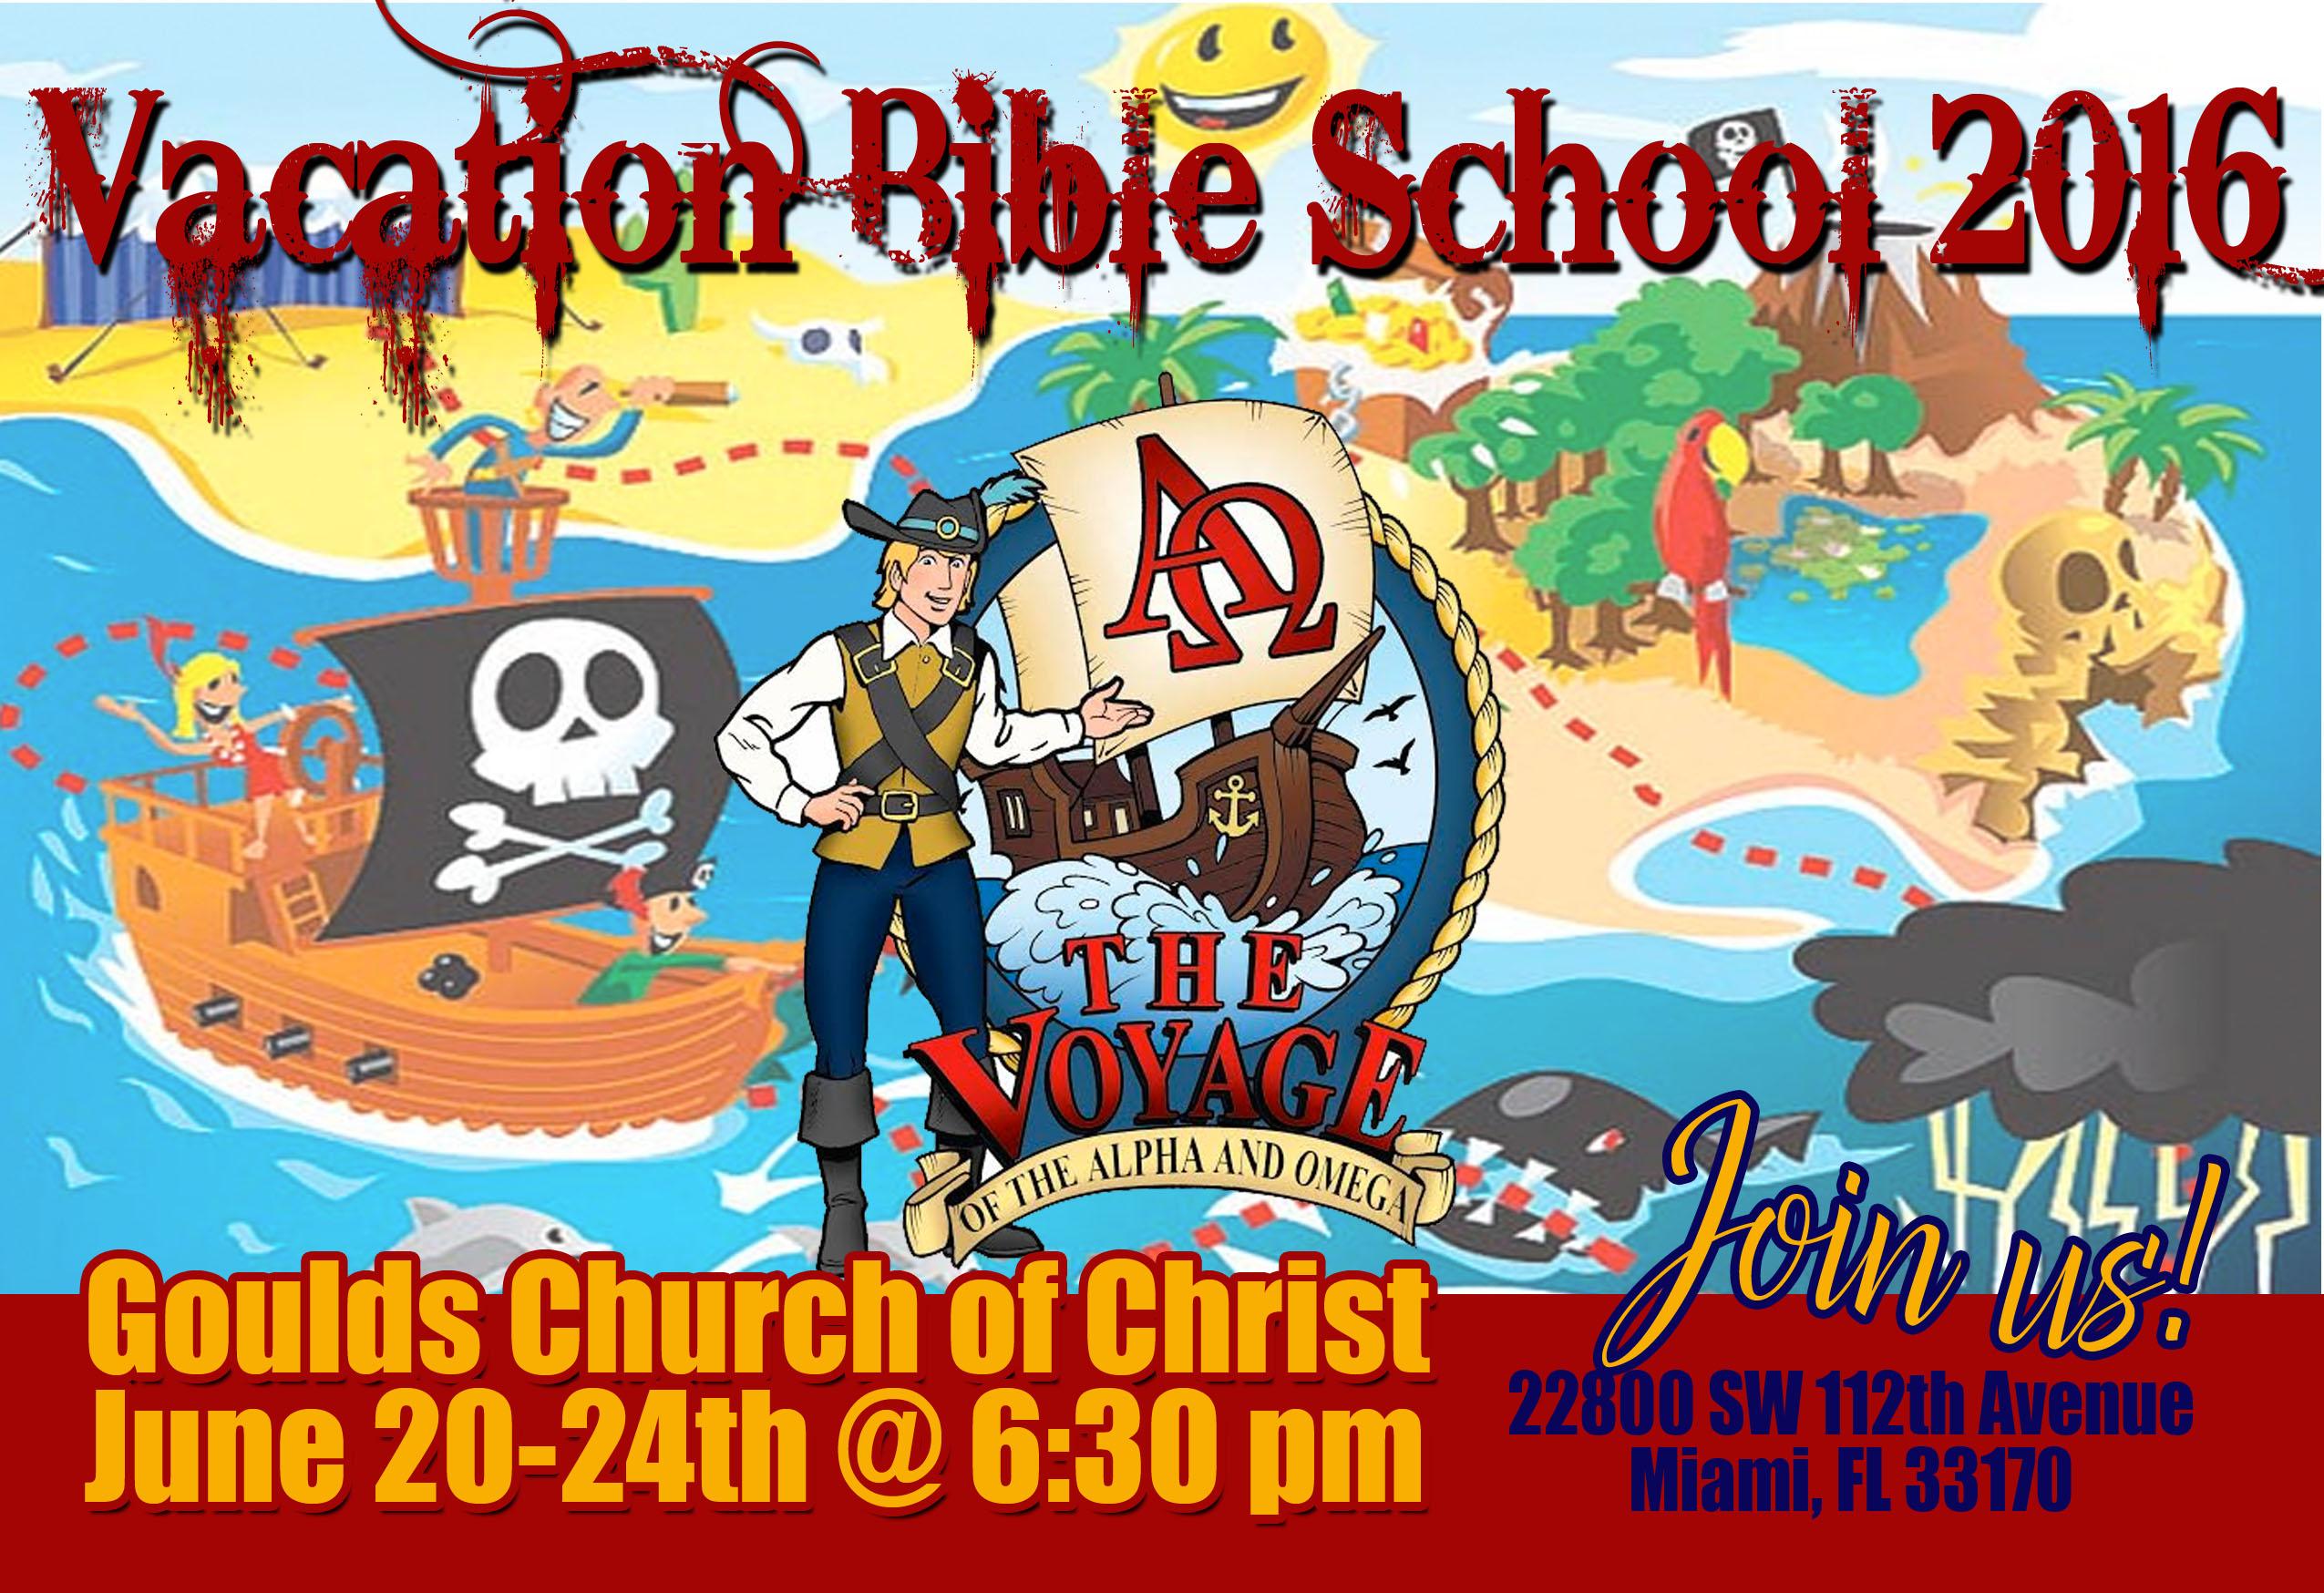 Vacation Bible School flyer